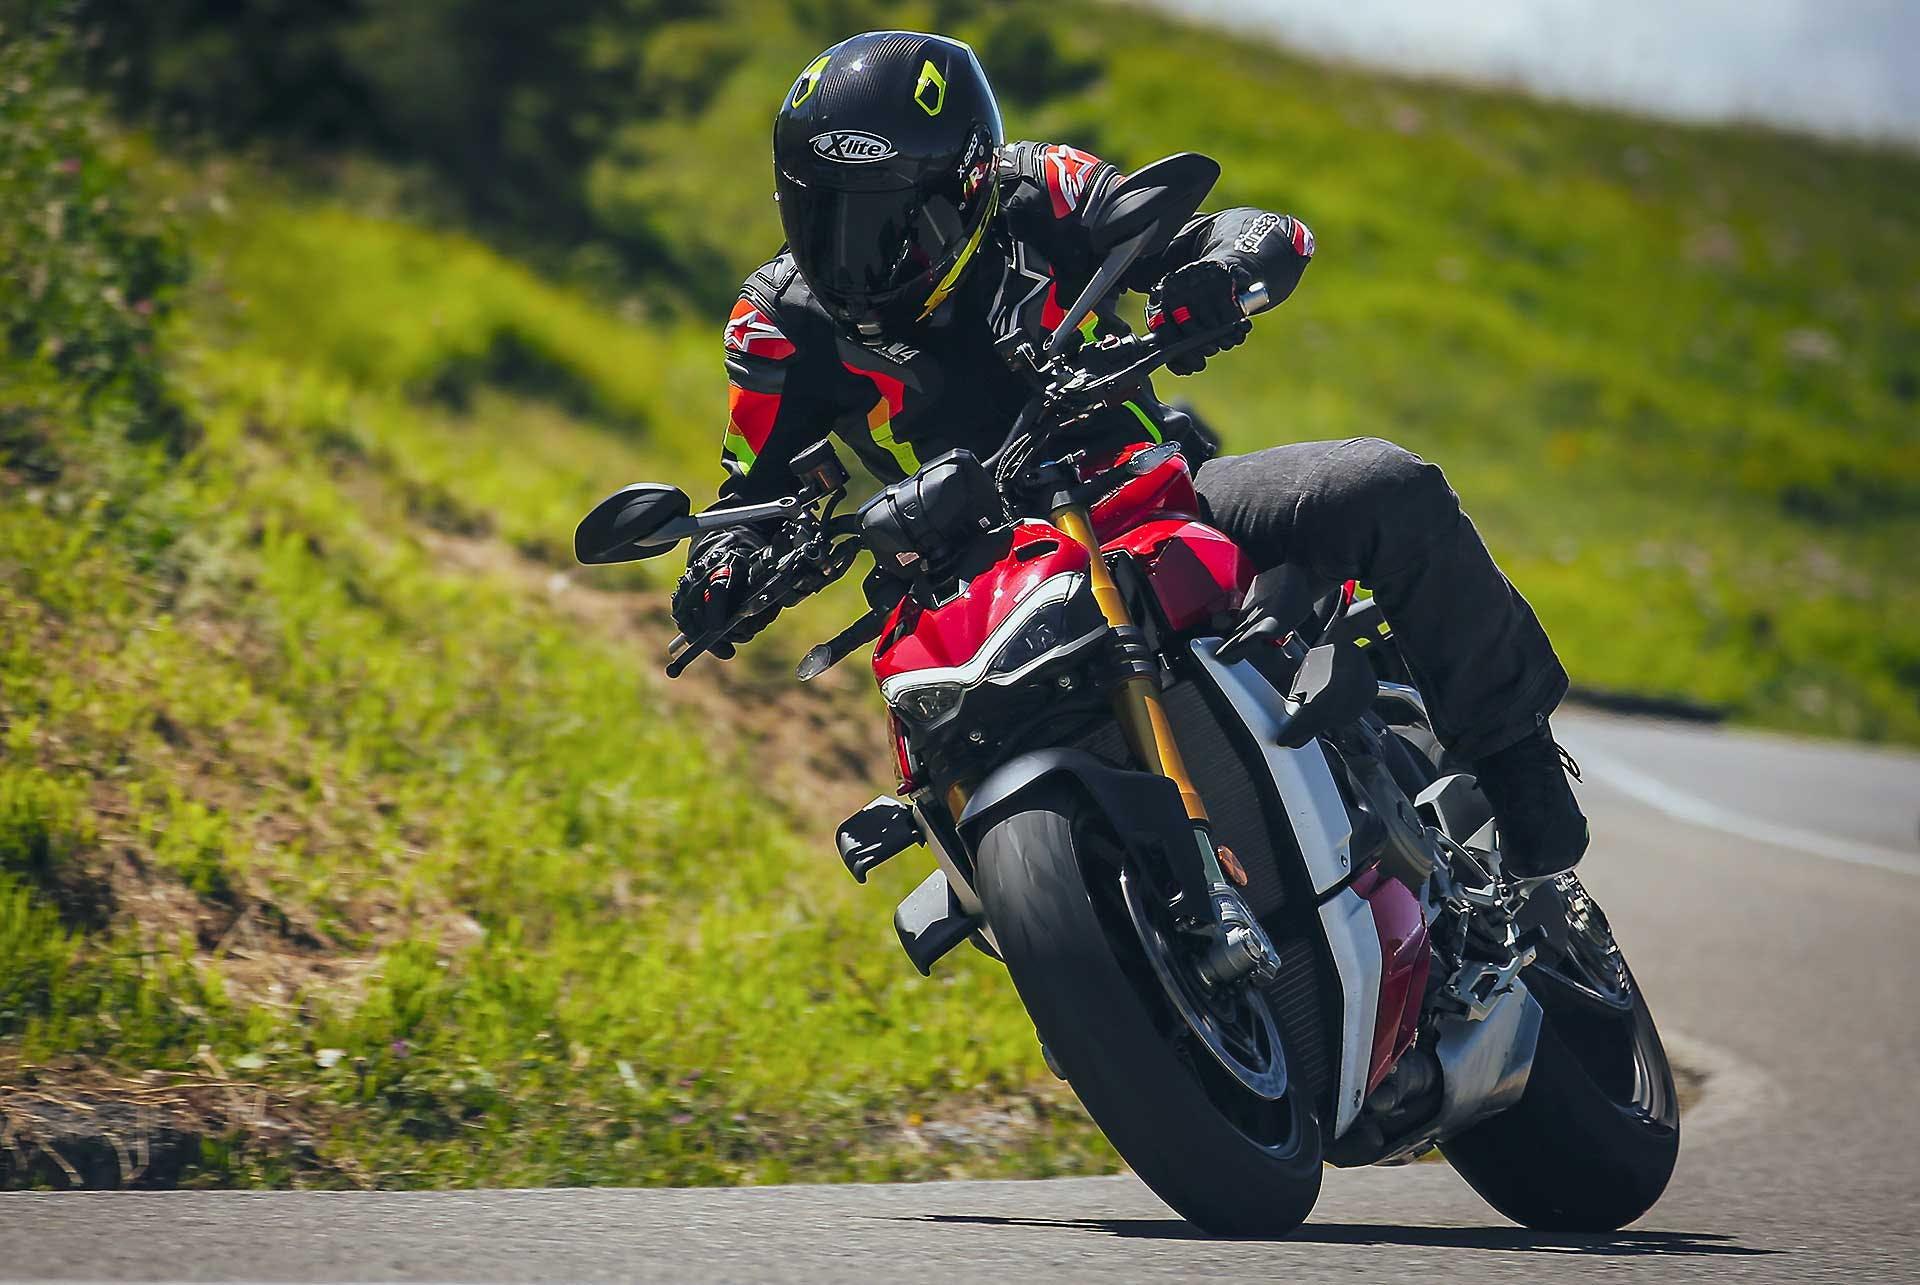 Ducati Streetfighter V4 S 2020 migliore maxi naked